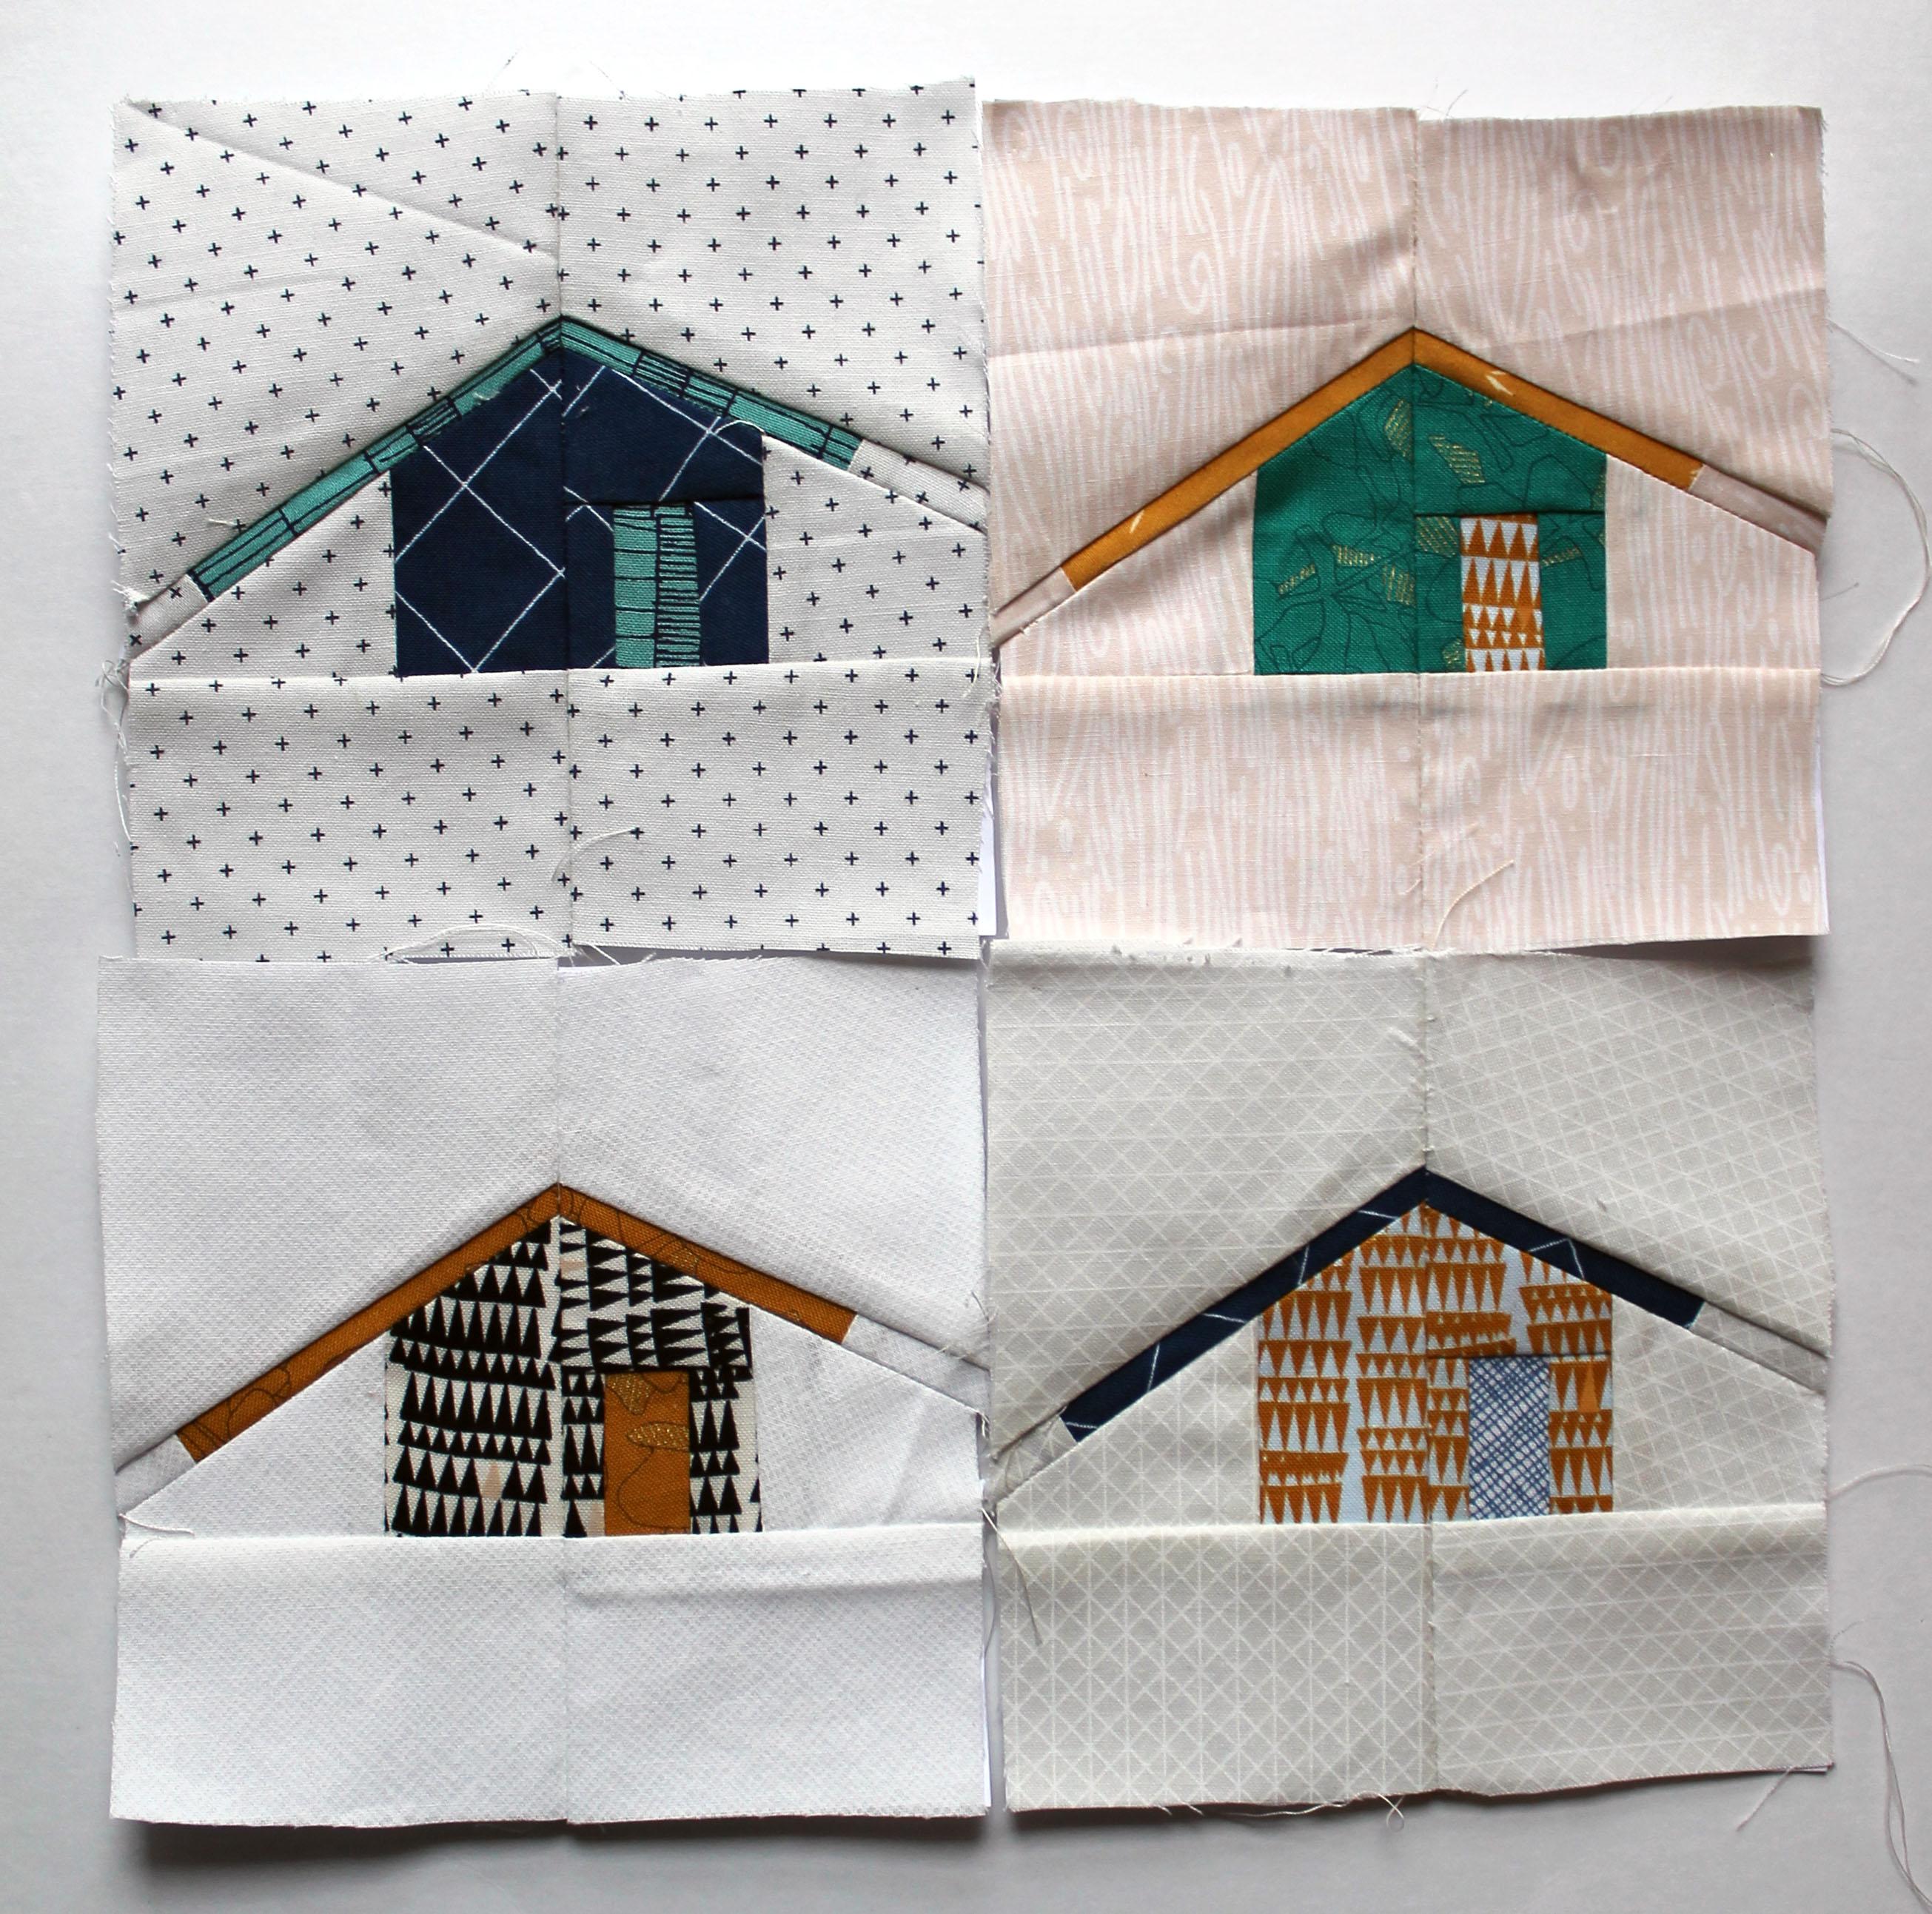 Quilt Block Patterns Of Houses : house quilt block WOMBAT QUILTS